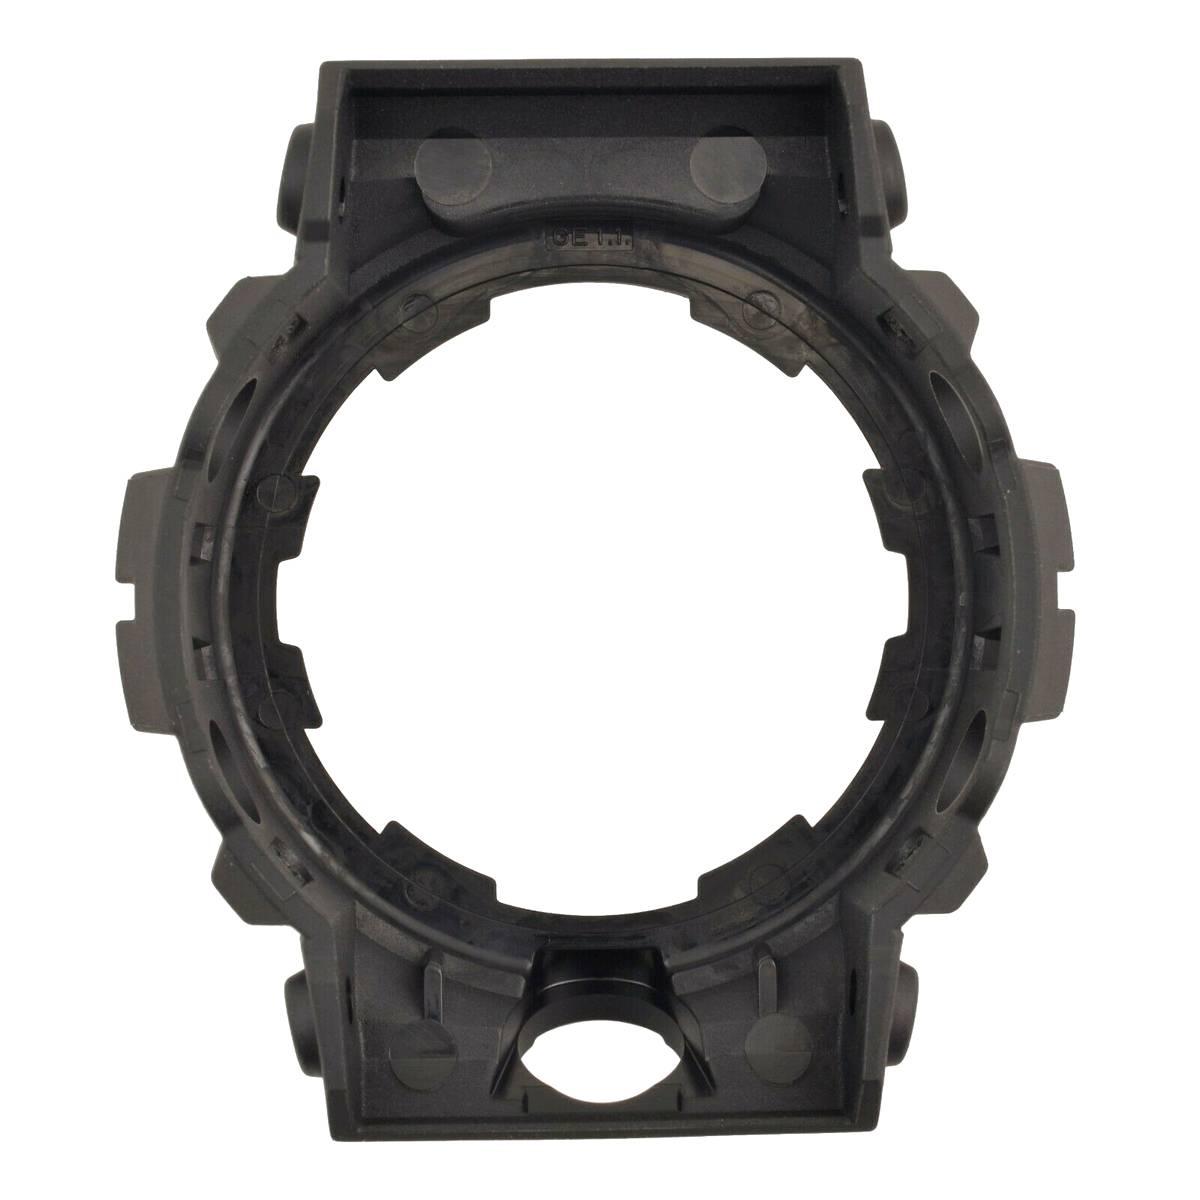 Bezel  Casio G-shock  GBA-800SF-1AGBA-800-1A Resina Preto  - E-Presentes